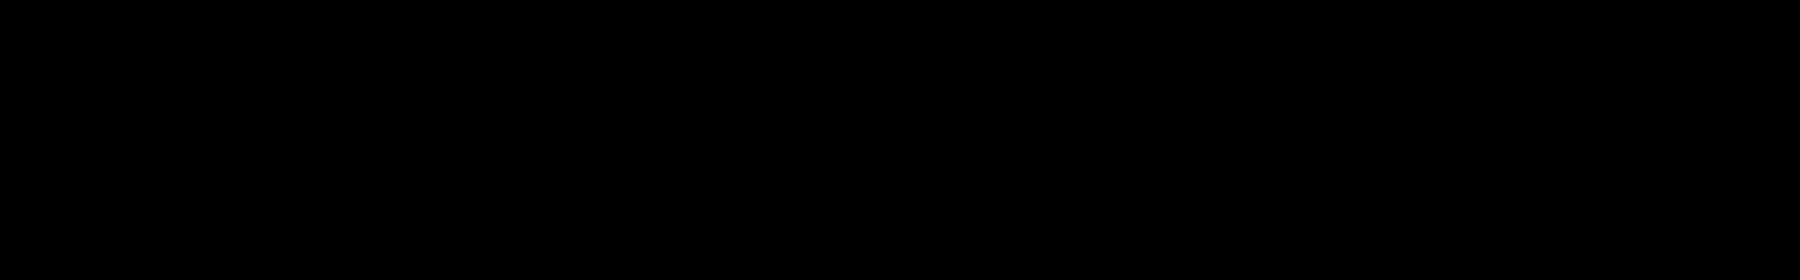 Modern Cthulhu 1 audio waveform